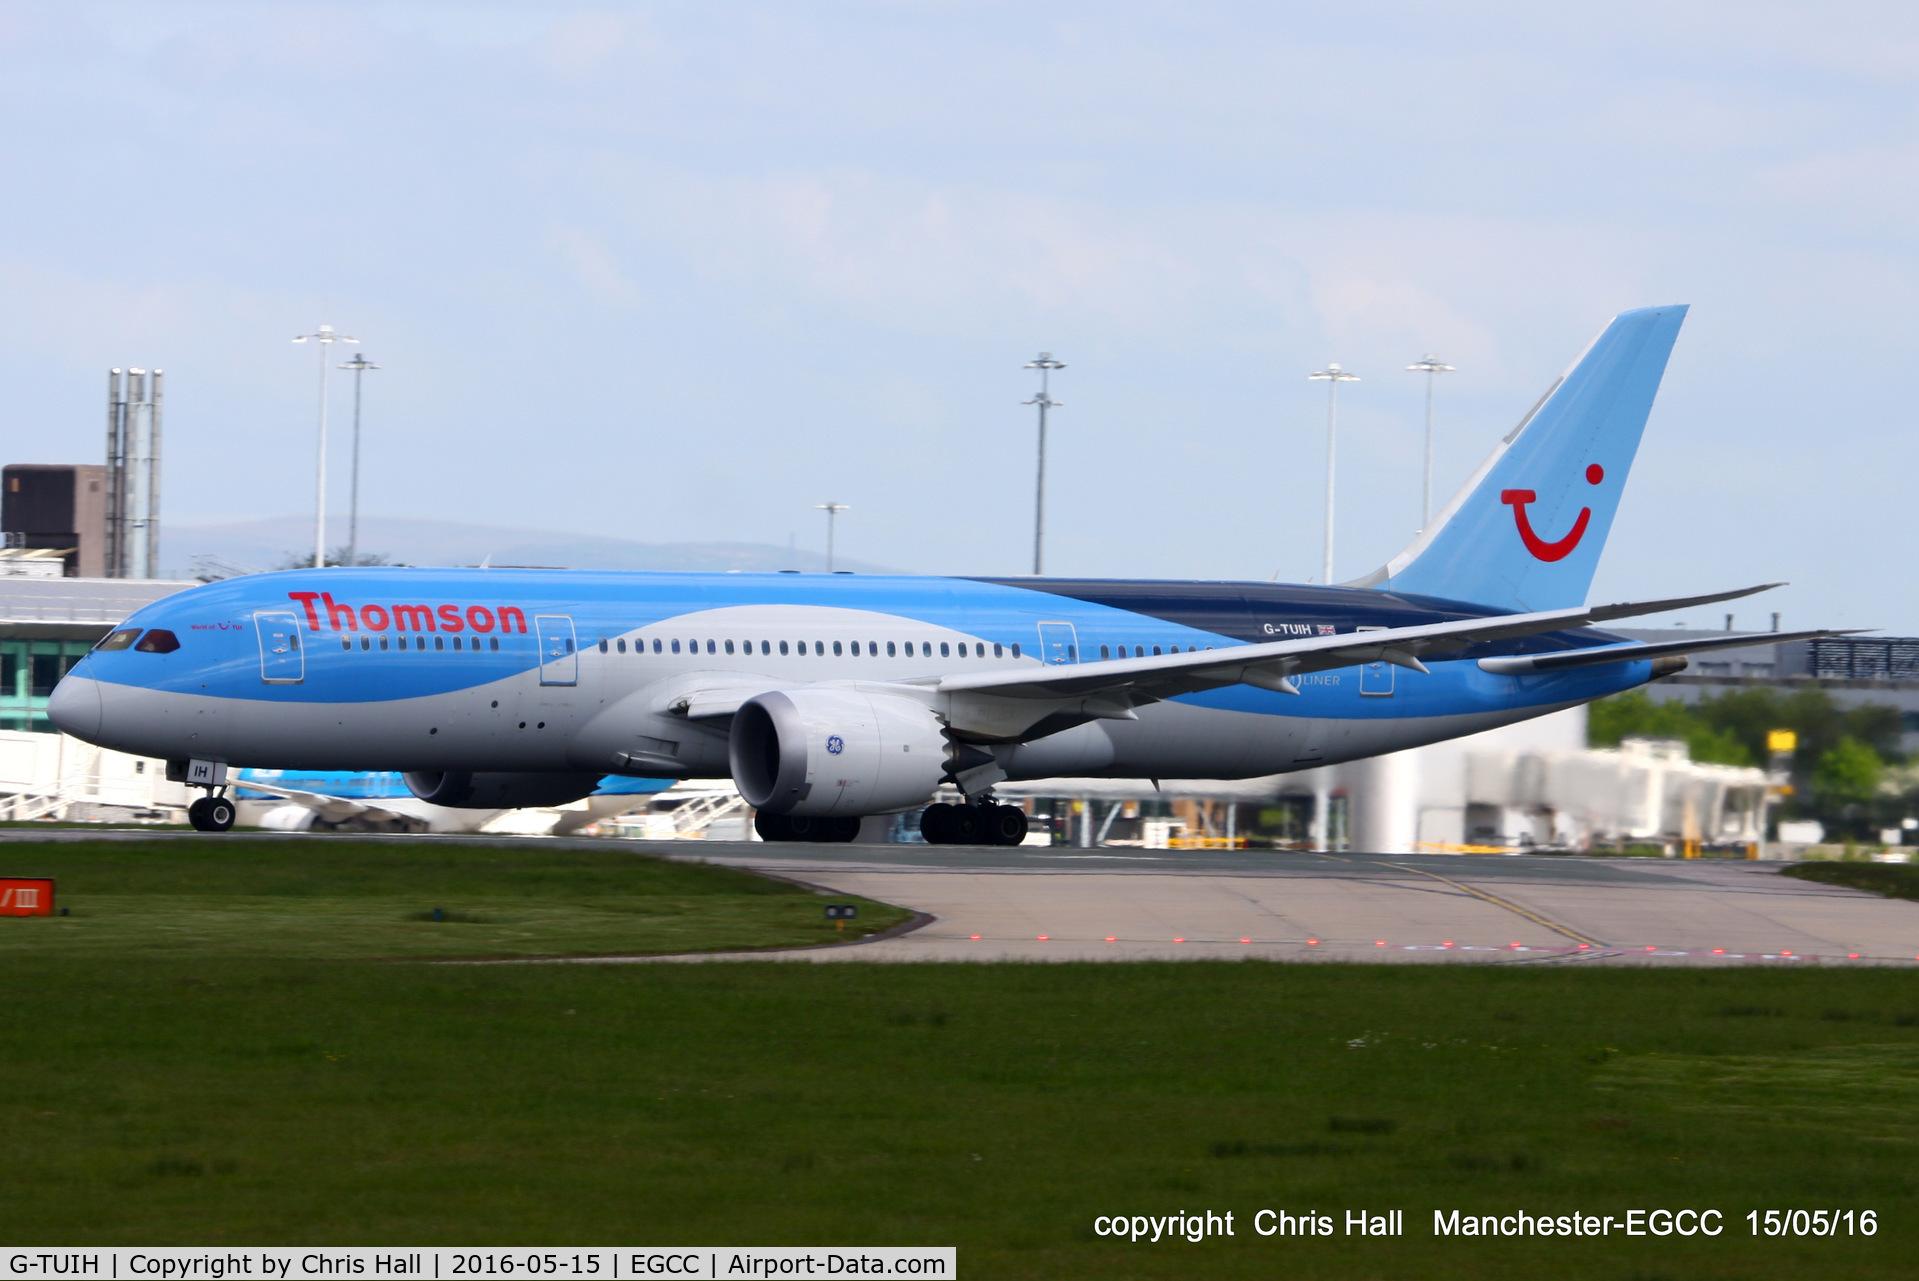 G-TUIH, 2015 Boeing 787-8 Dreamliner C/N 37229, Thomson